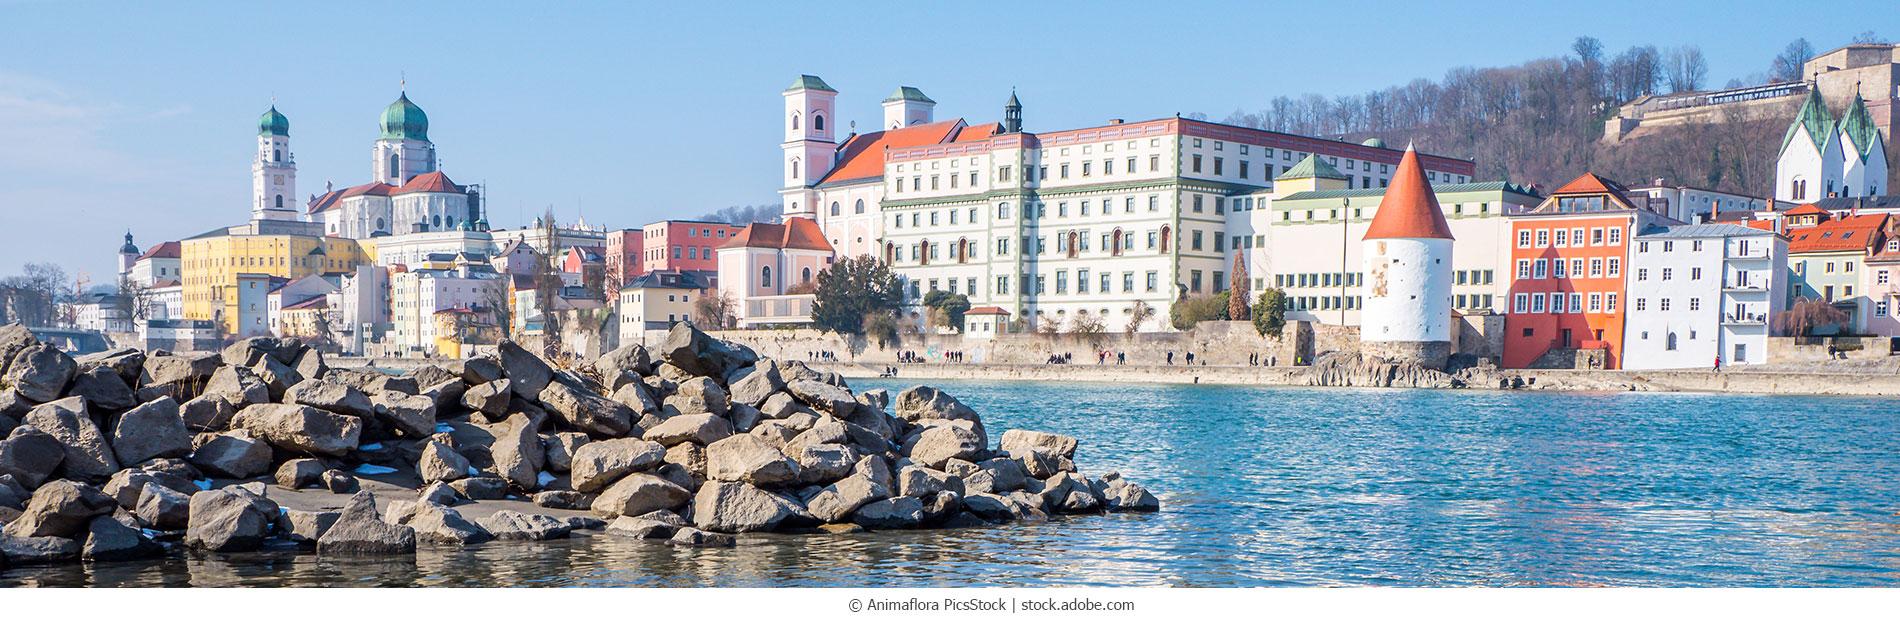 Passau_194841779_webC